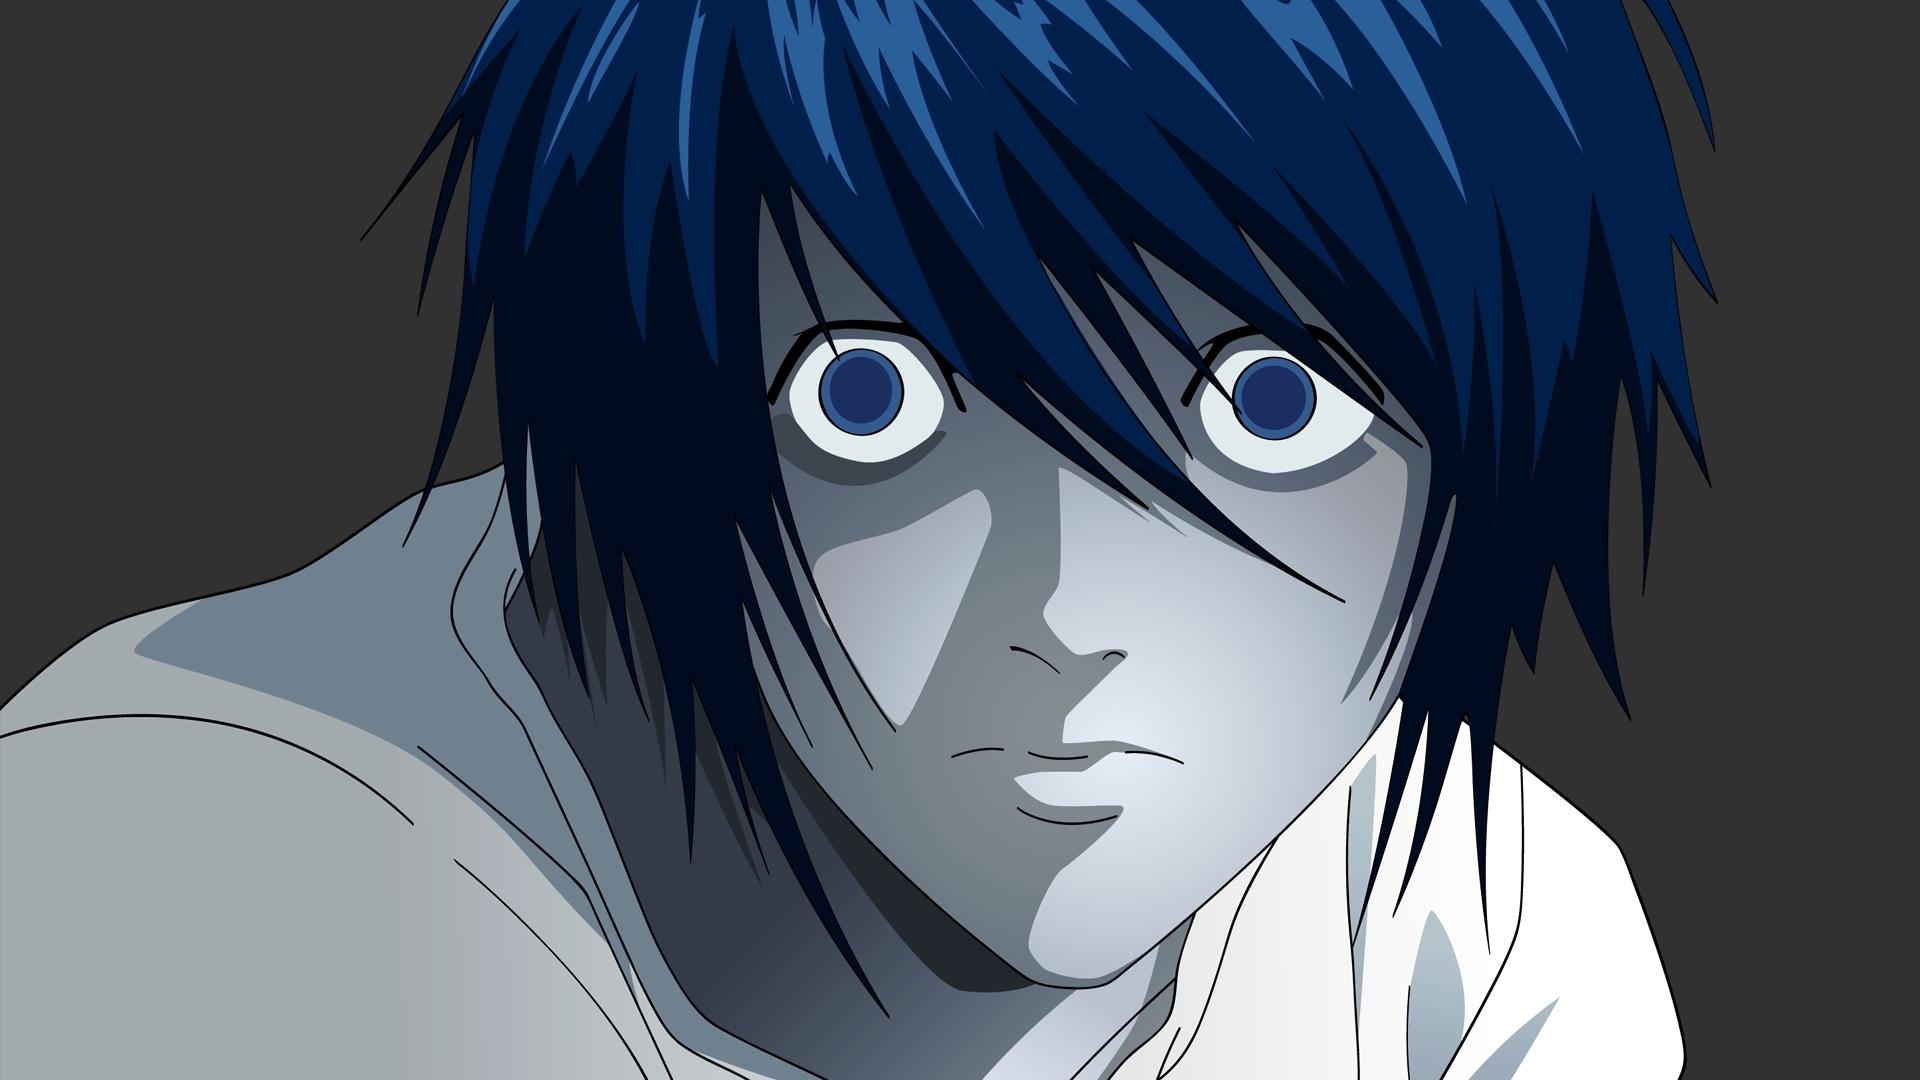 L (Death Note) vs MCU Kilgrave - Battles - Comic Vine |L Death Note